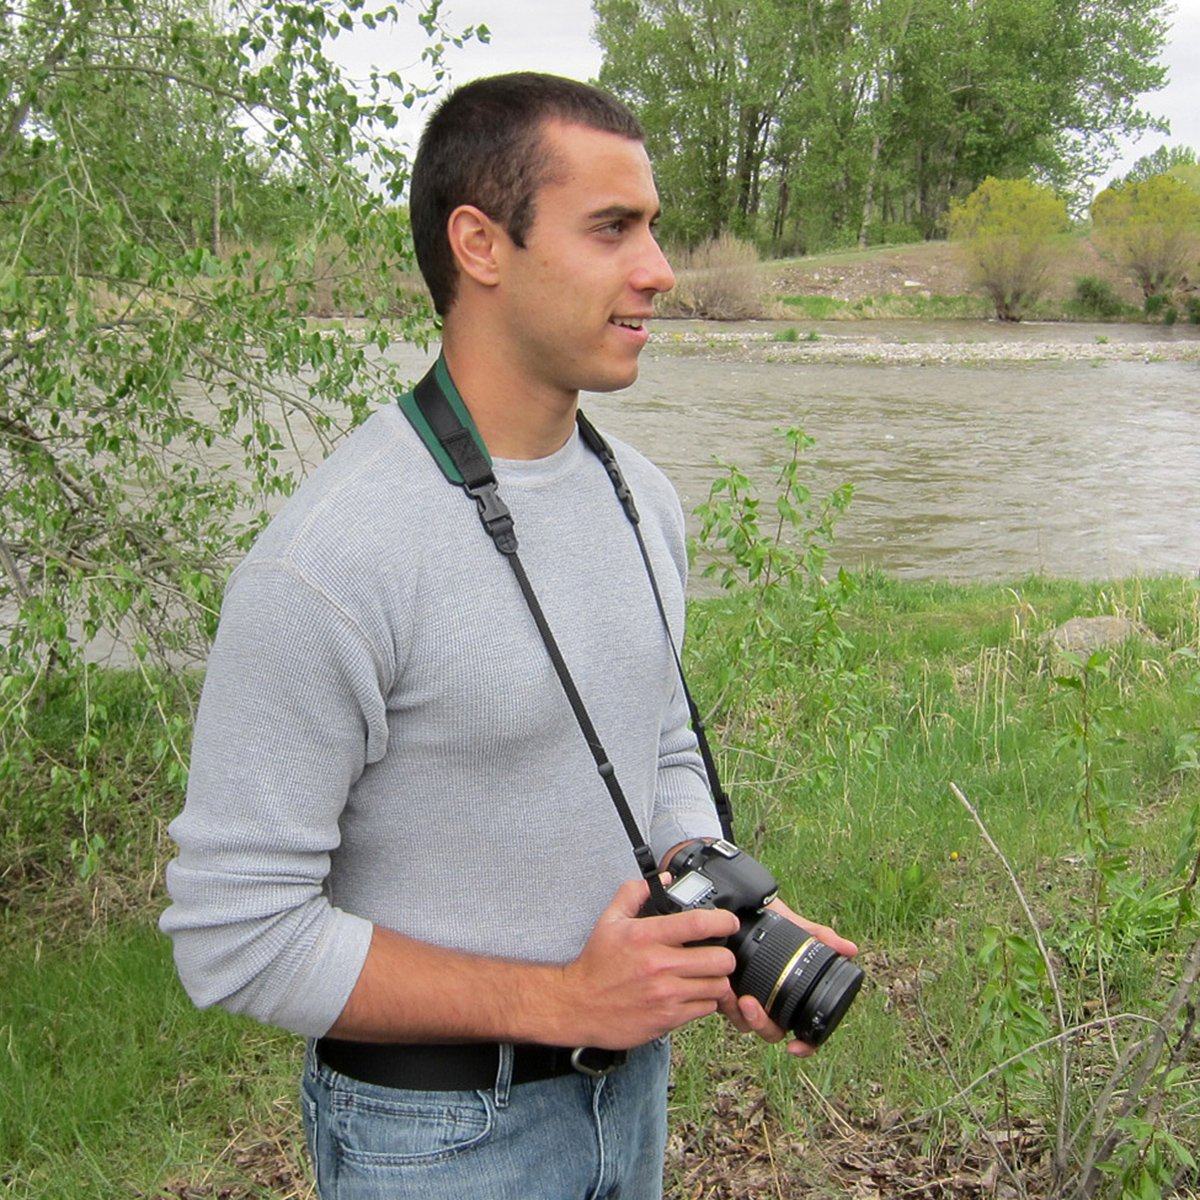 OpTech Pro - Correa para cámaras de fotos, videocámaras y prismáticos, diseño de camuflaje OP/TECH USA 1510012